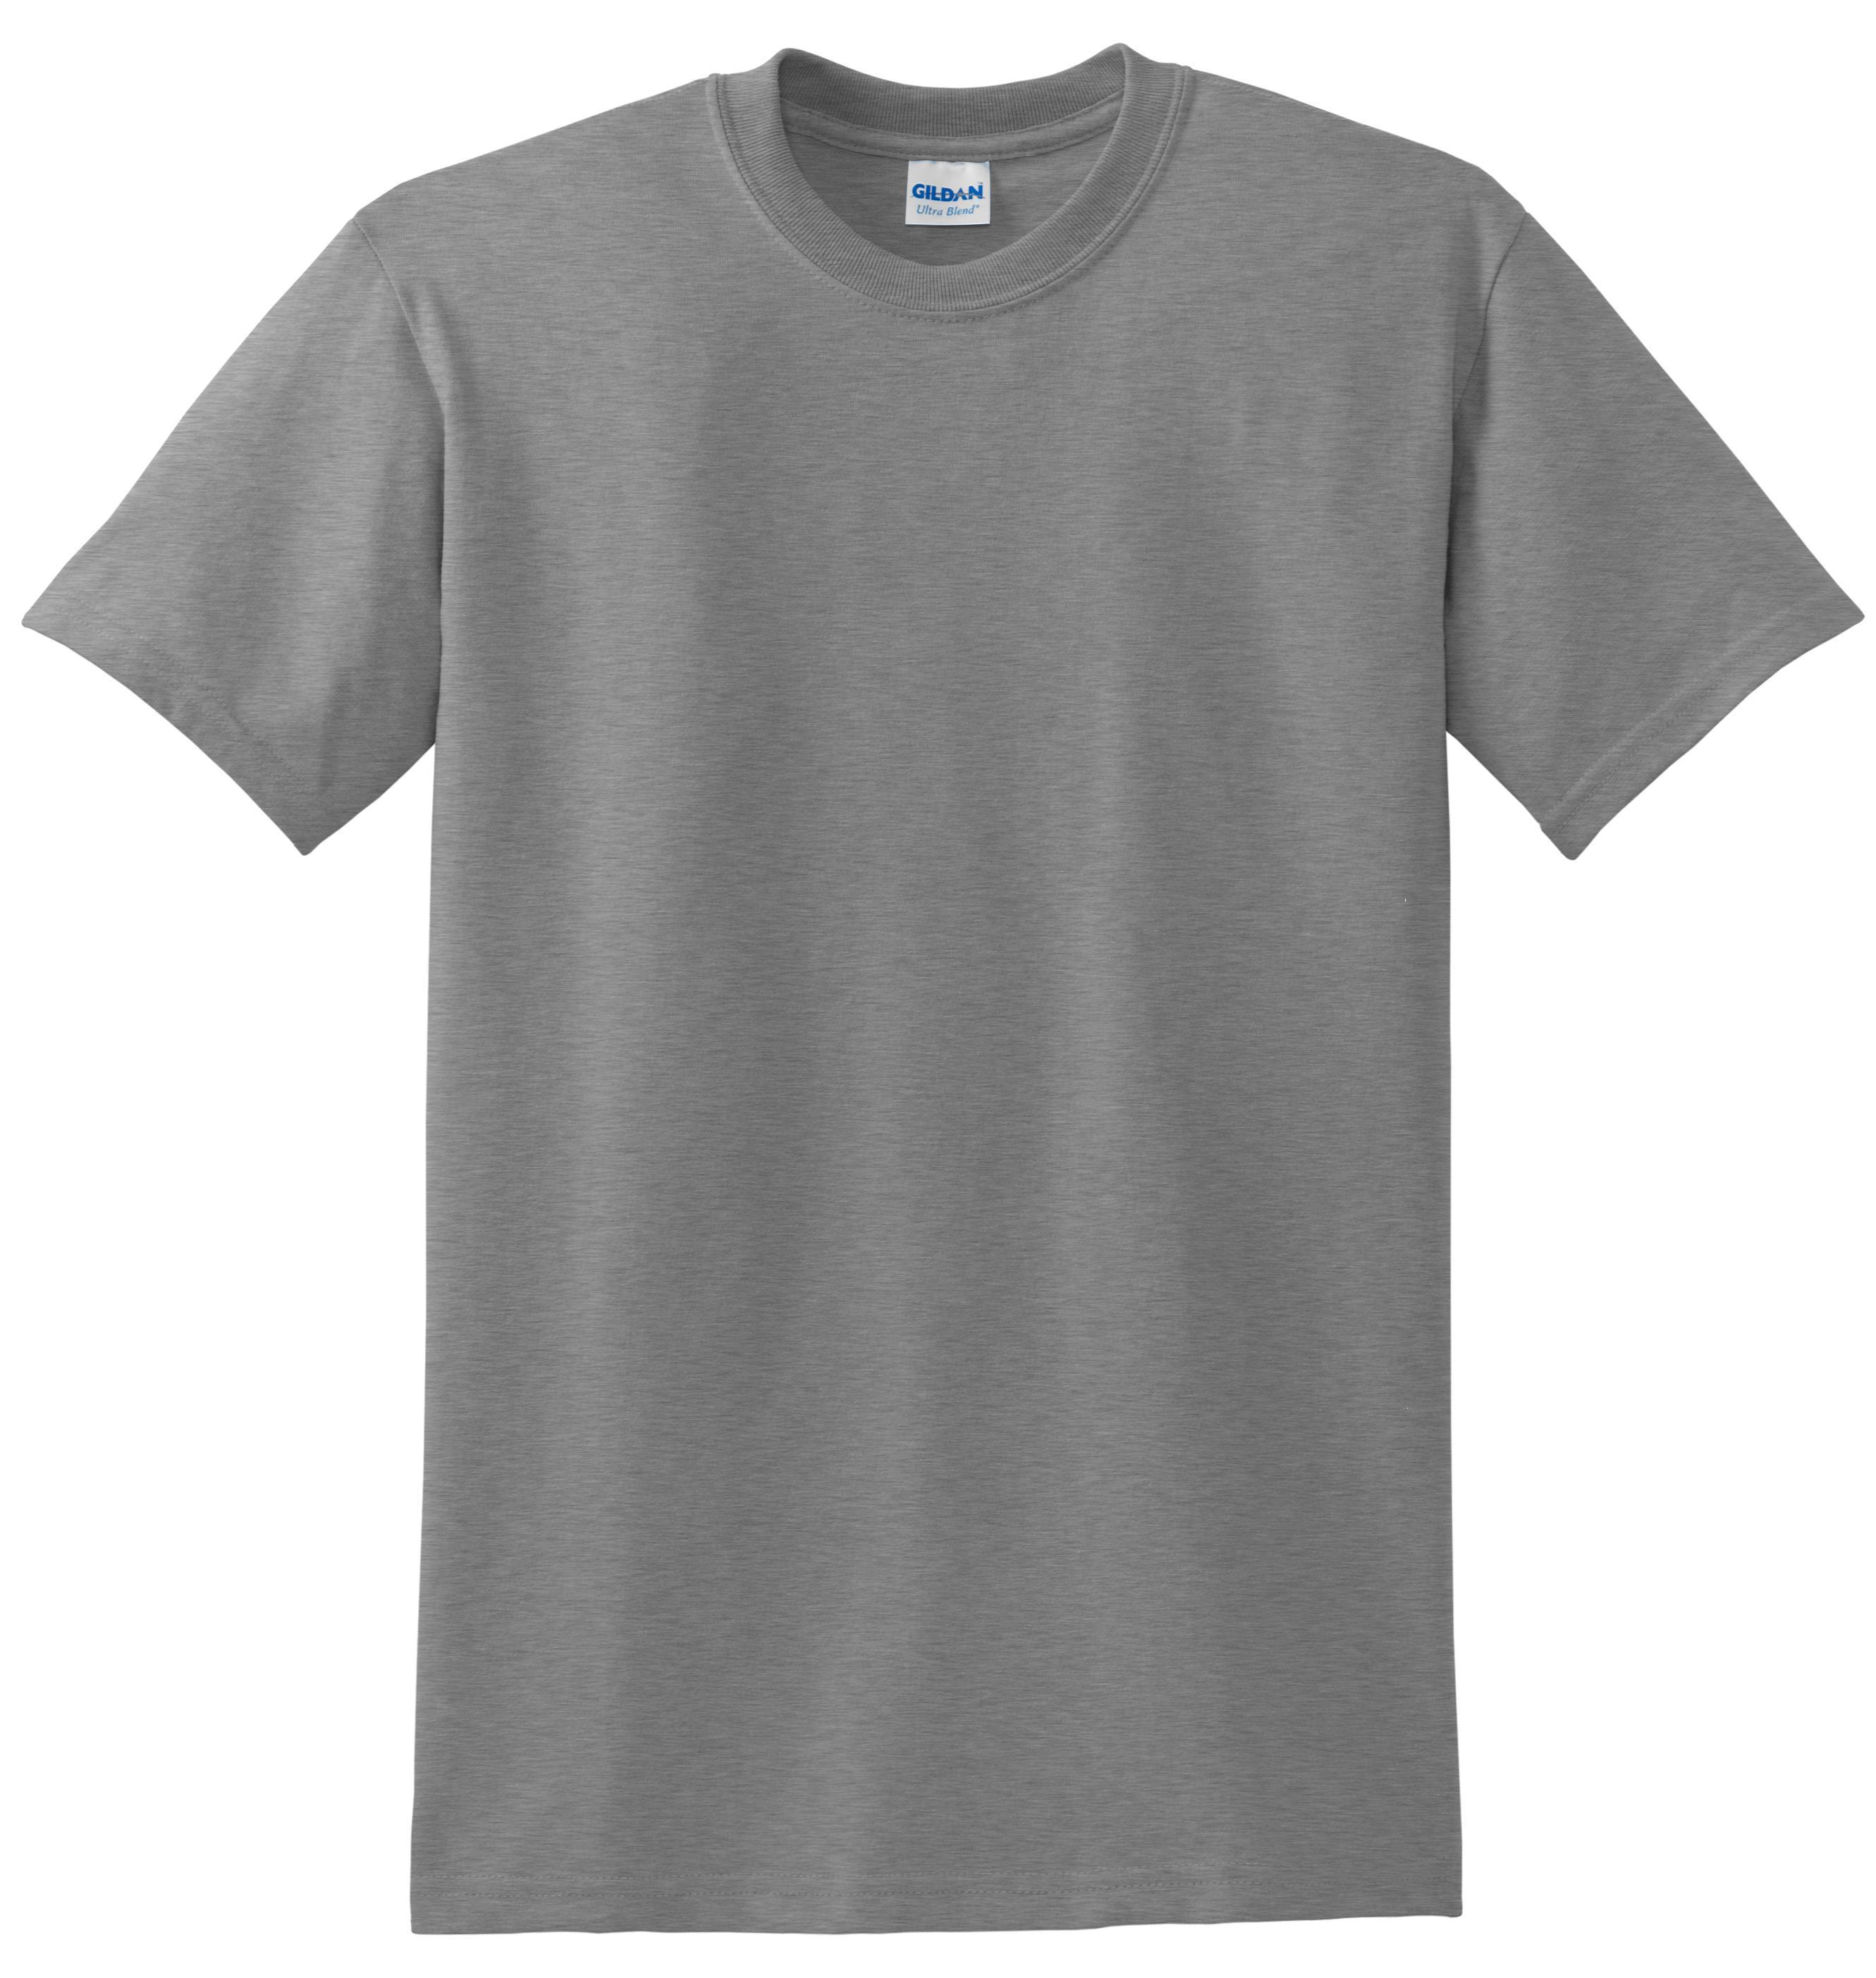 Gildan T Shirt 8000 Screen Printing Embroidery And Custom T